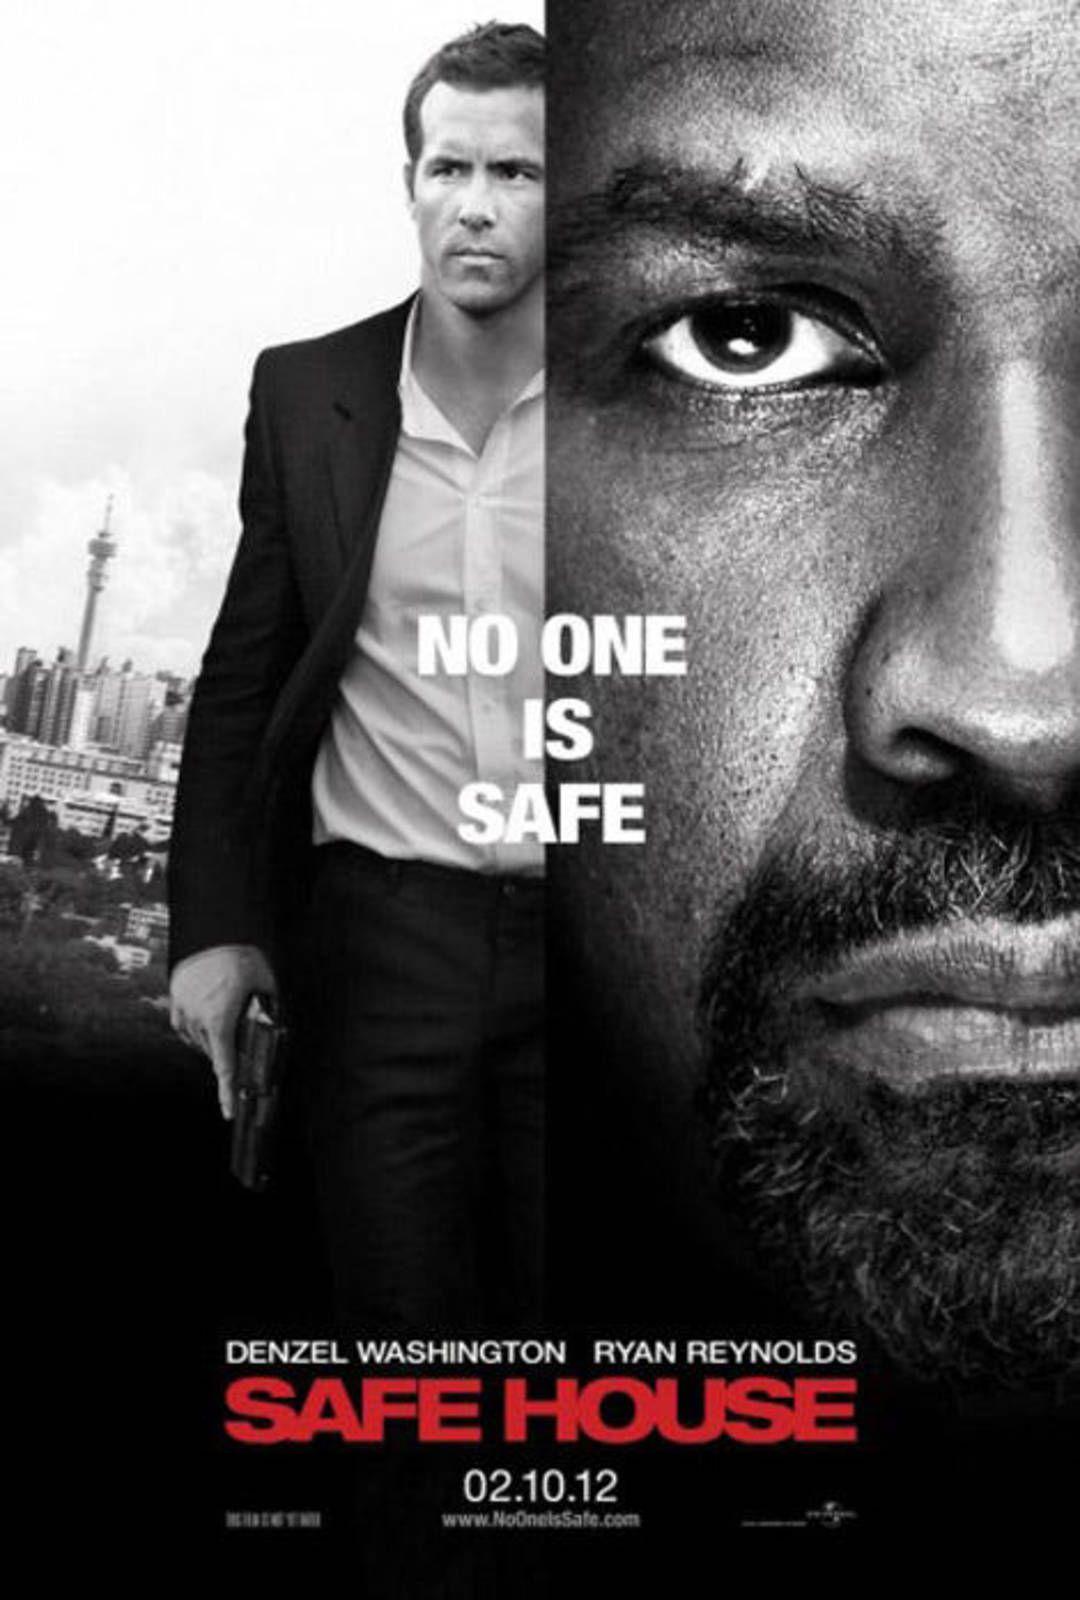 Securite Rapprochee Denzel Washington Ryan Reynolds Ver Peliculas Gratis